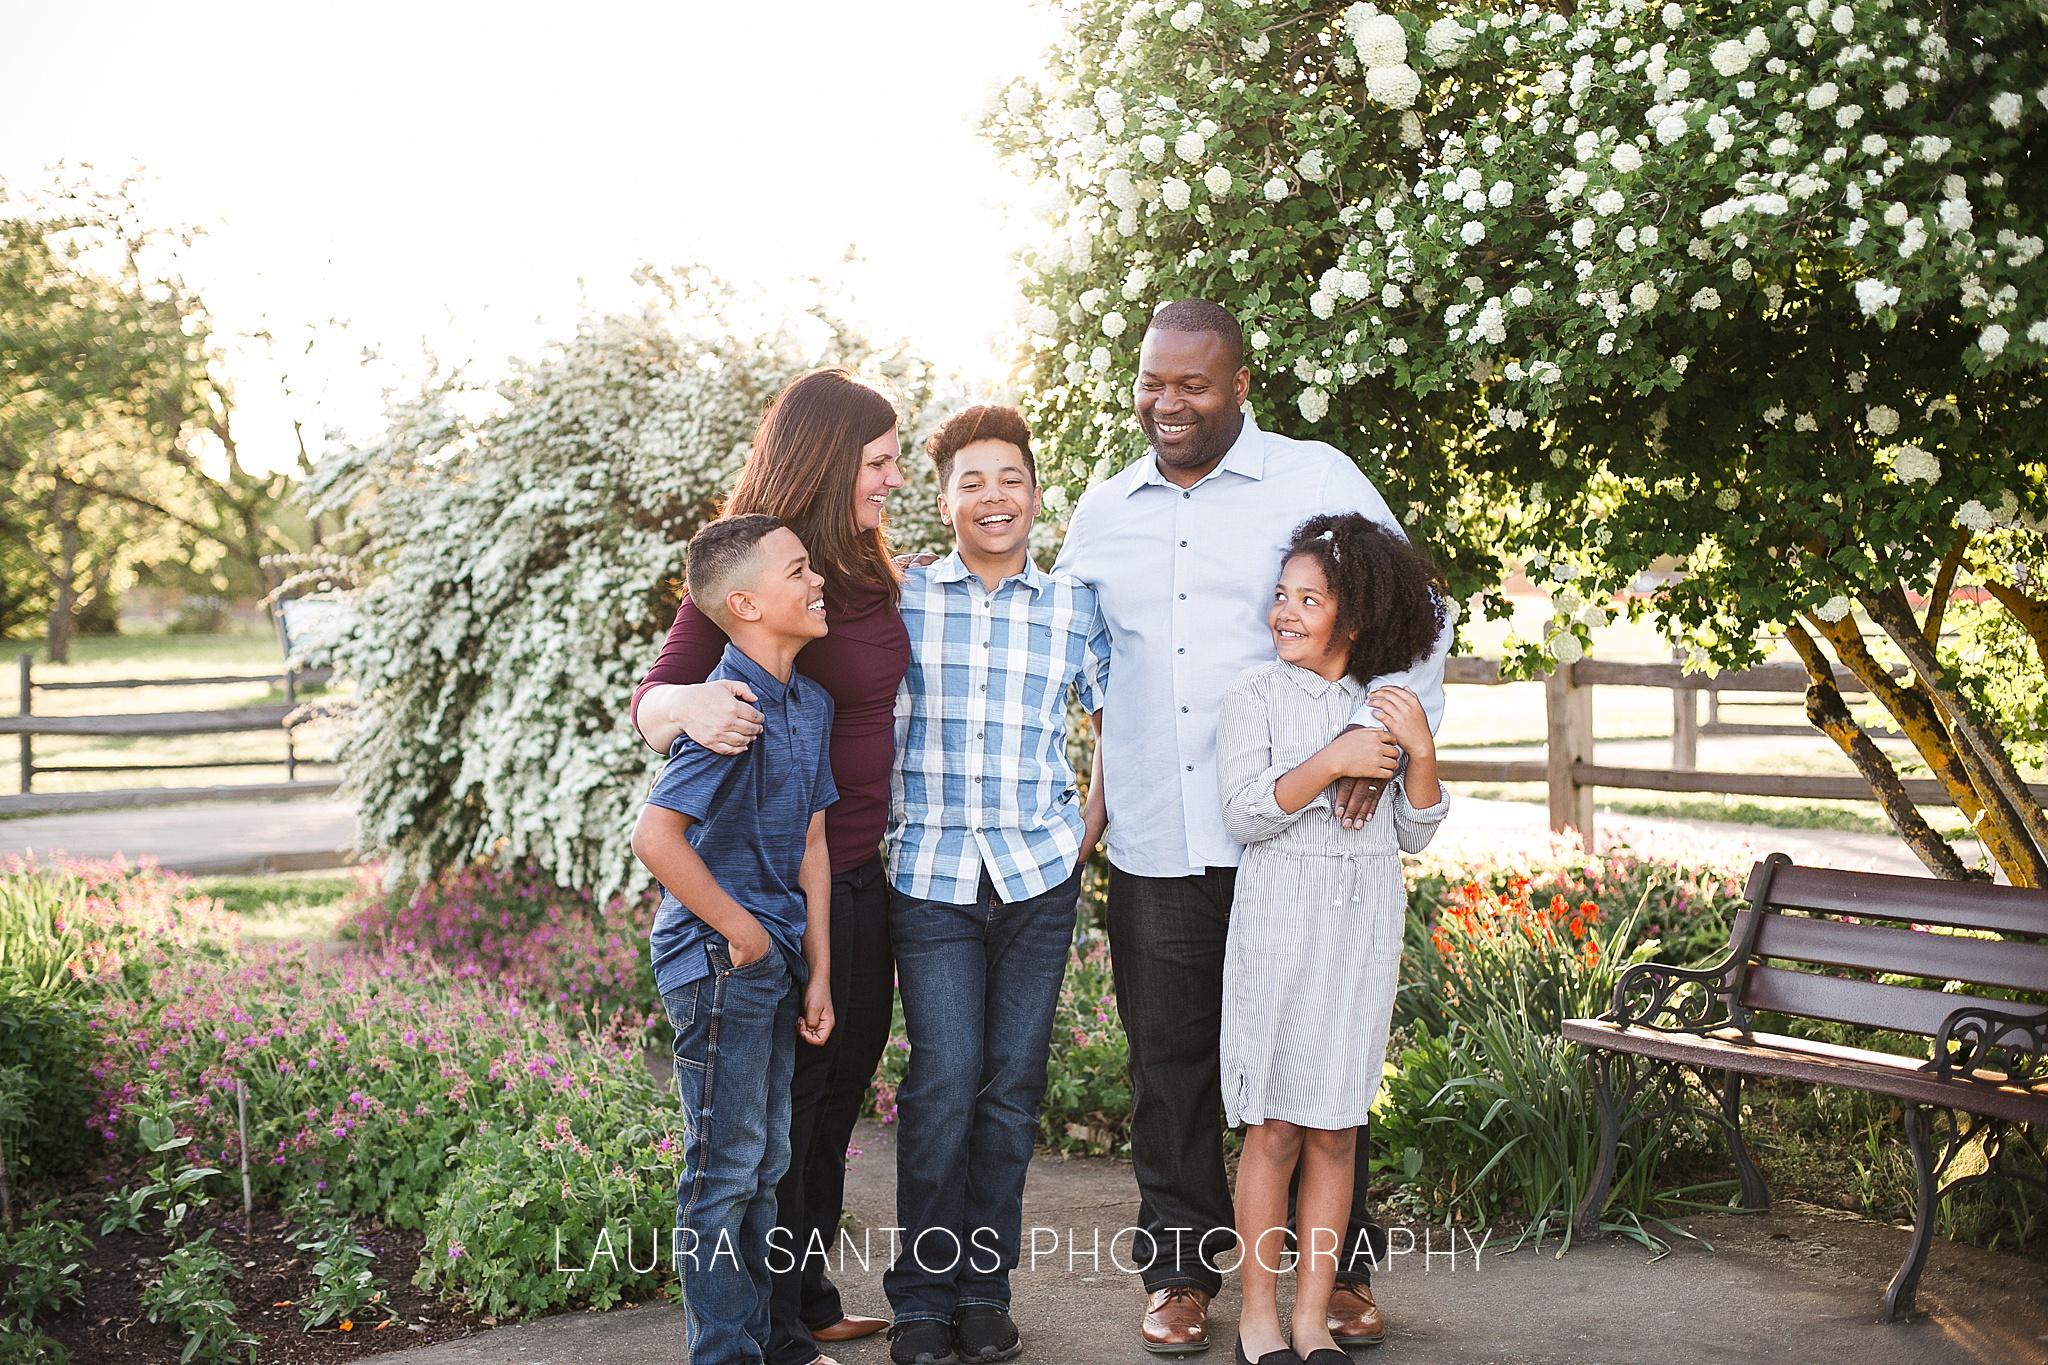 Laura Santos Photography Portland Oregon Family Photographer_0937.jpg